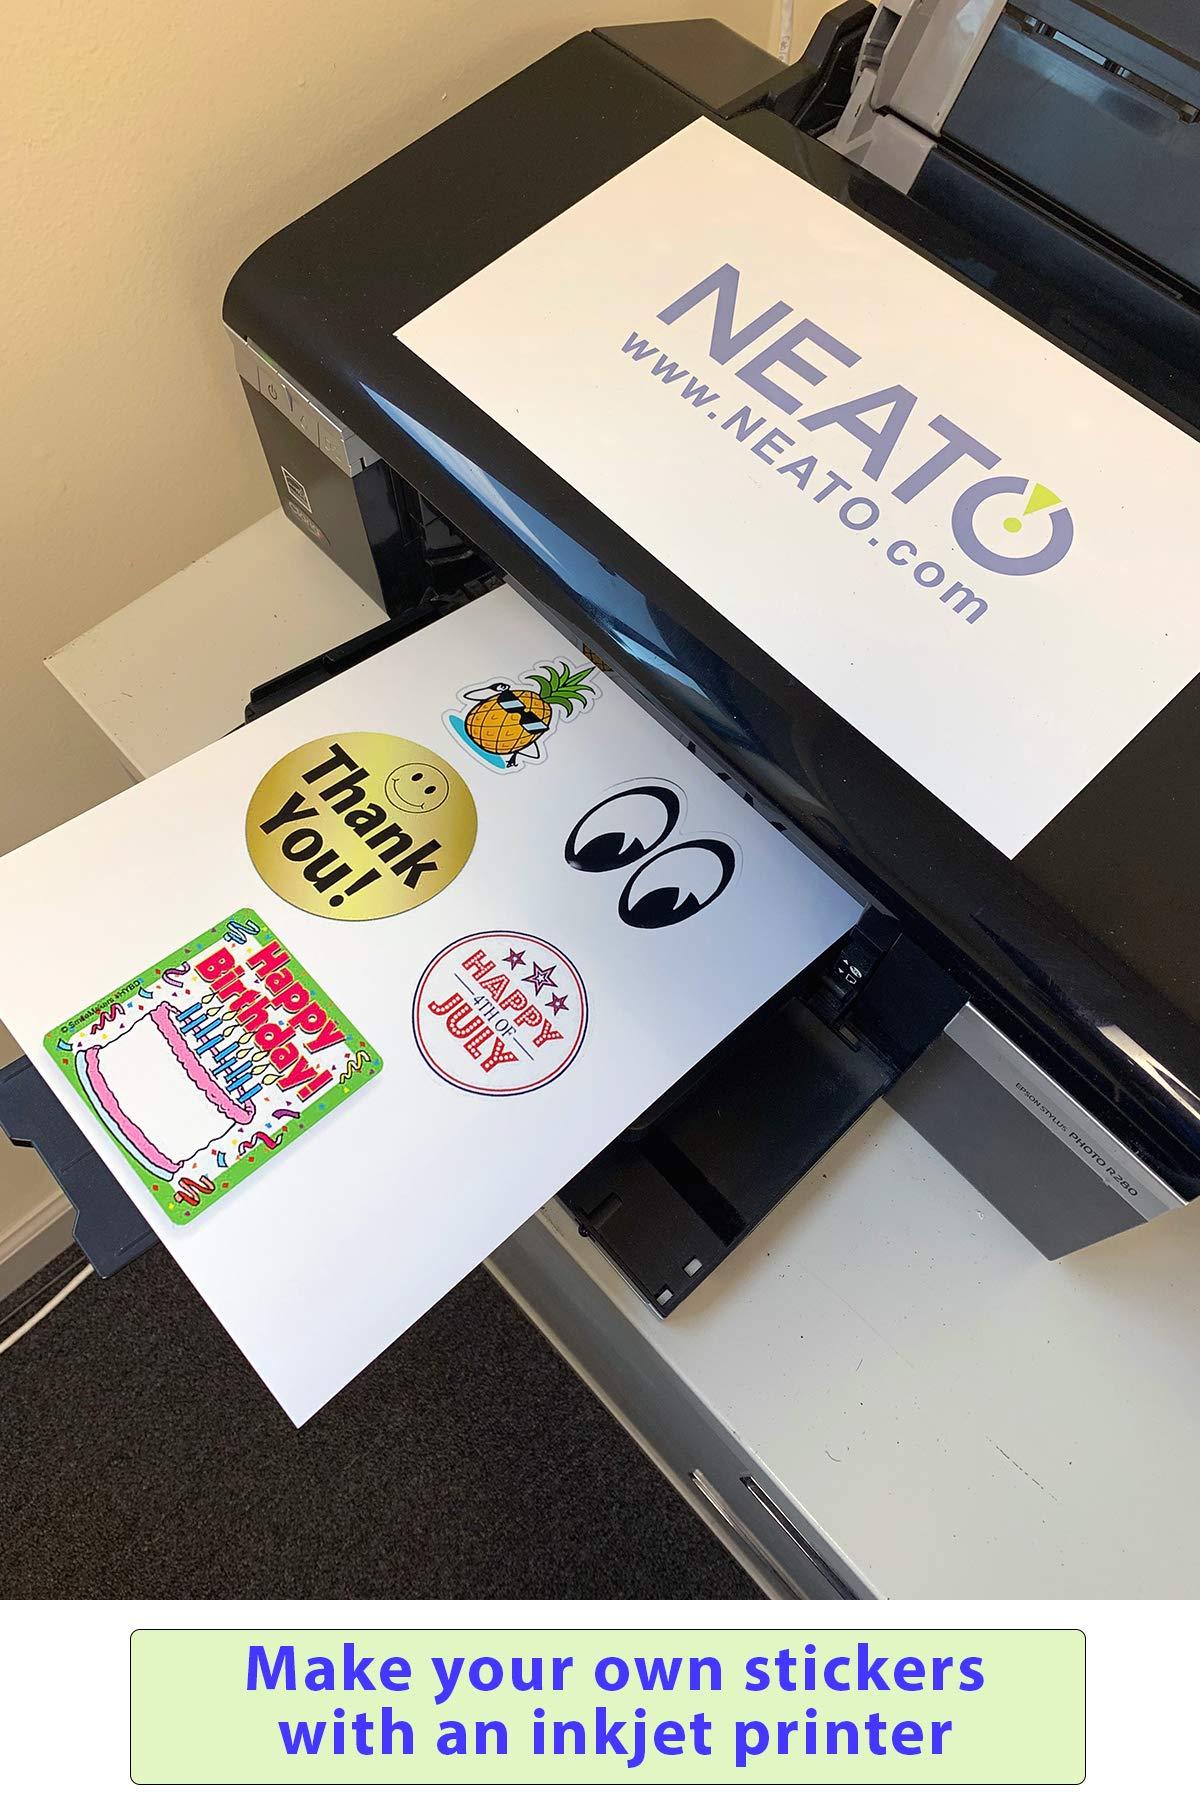 Neato Printable Glossy Vinyl Sticker Paper 10 Piece 8 5 X